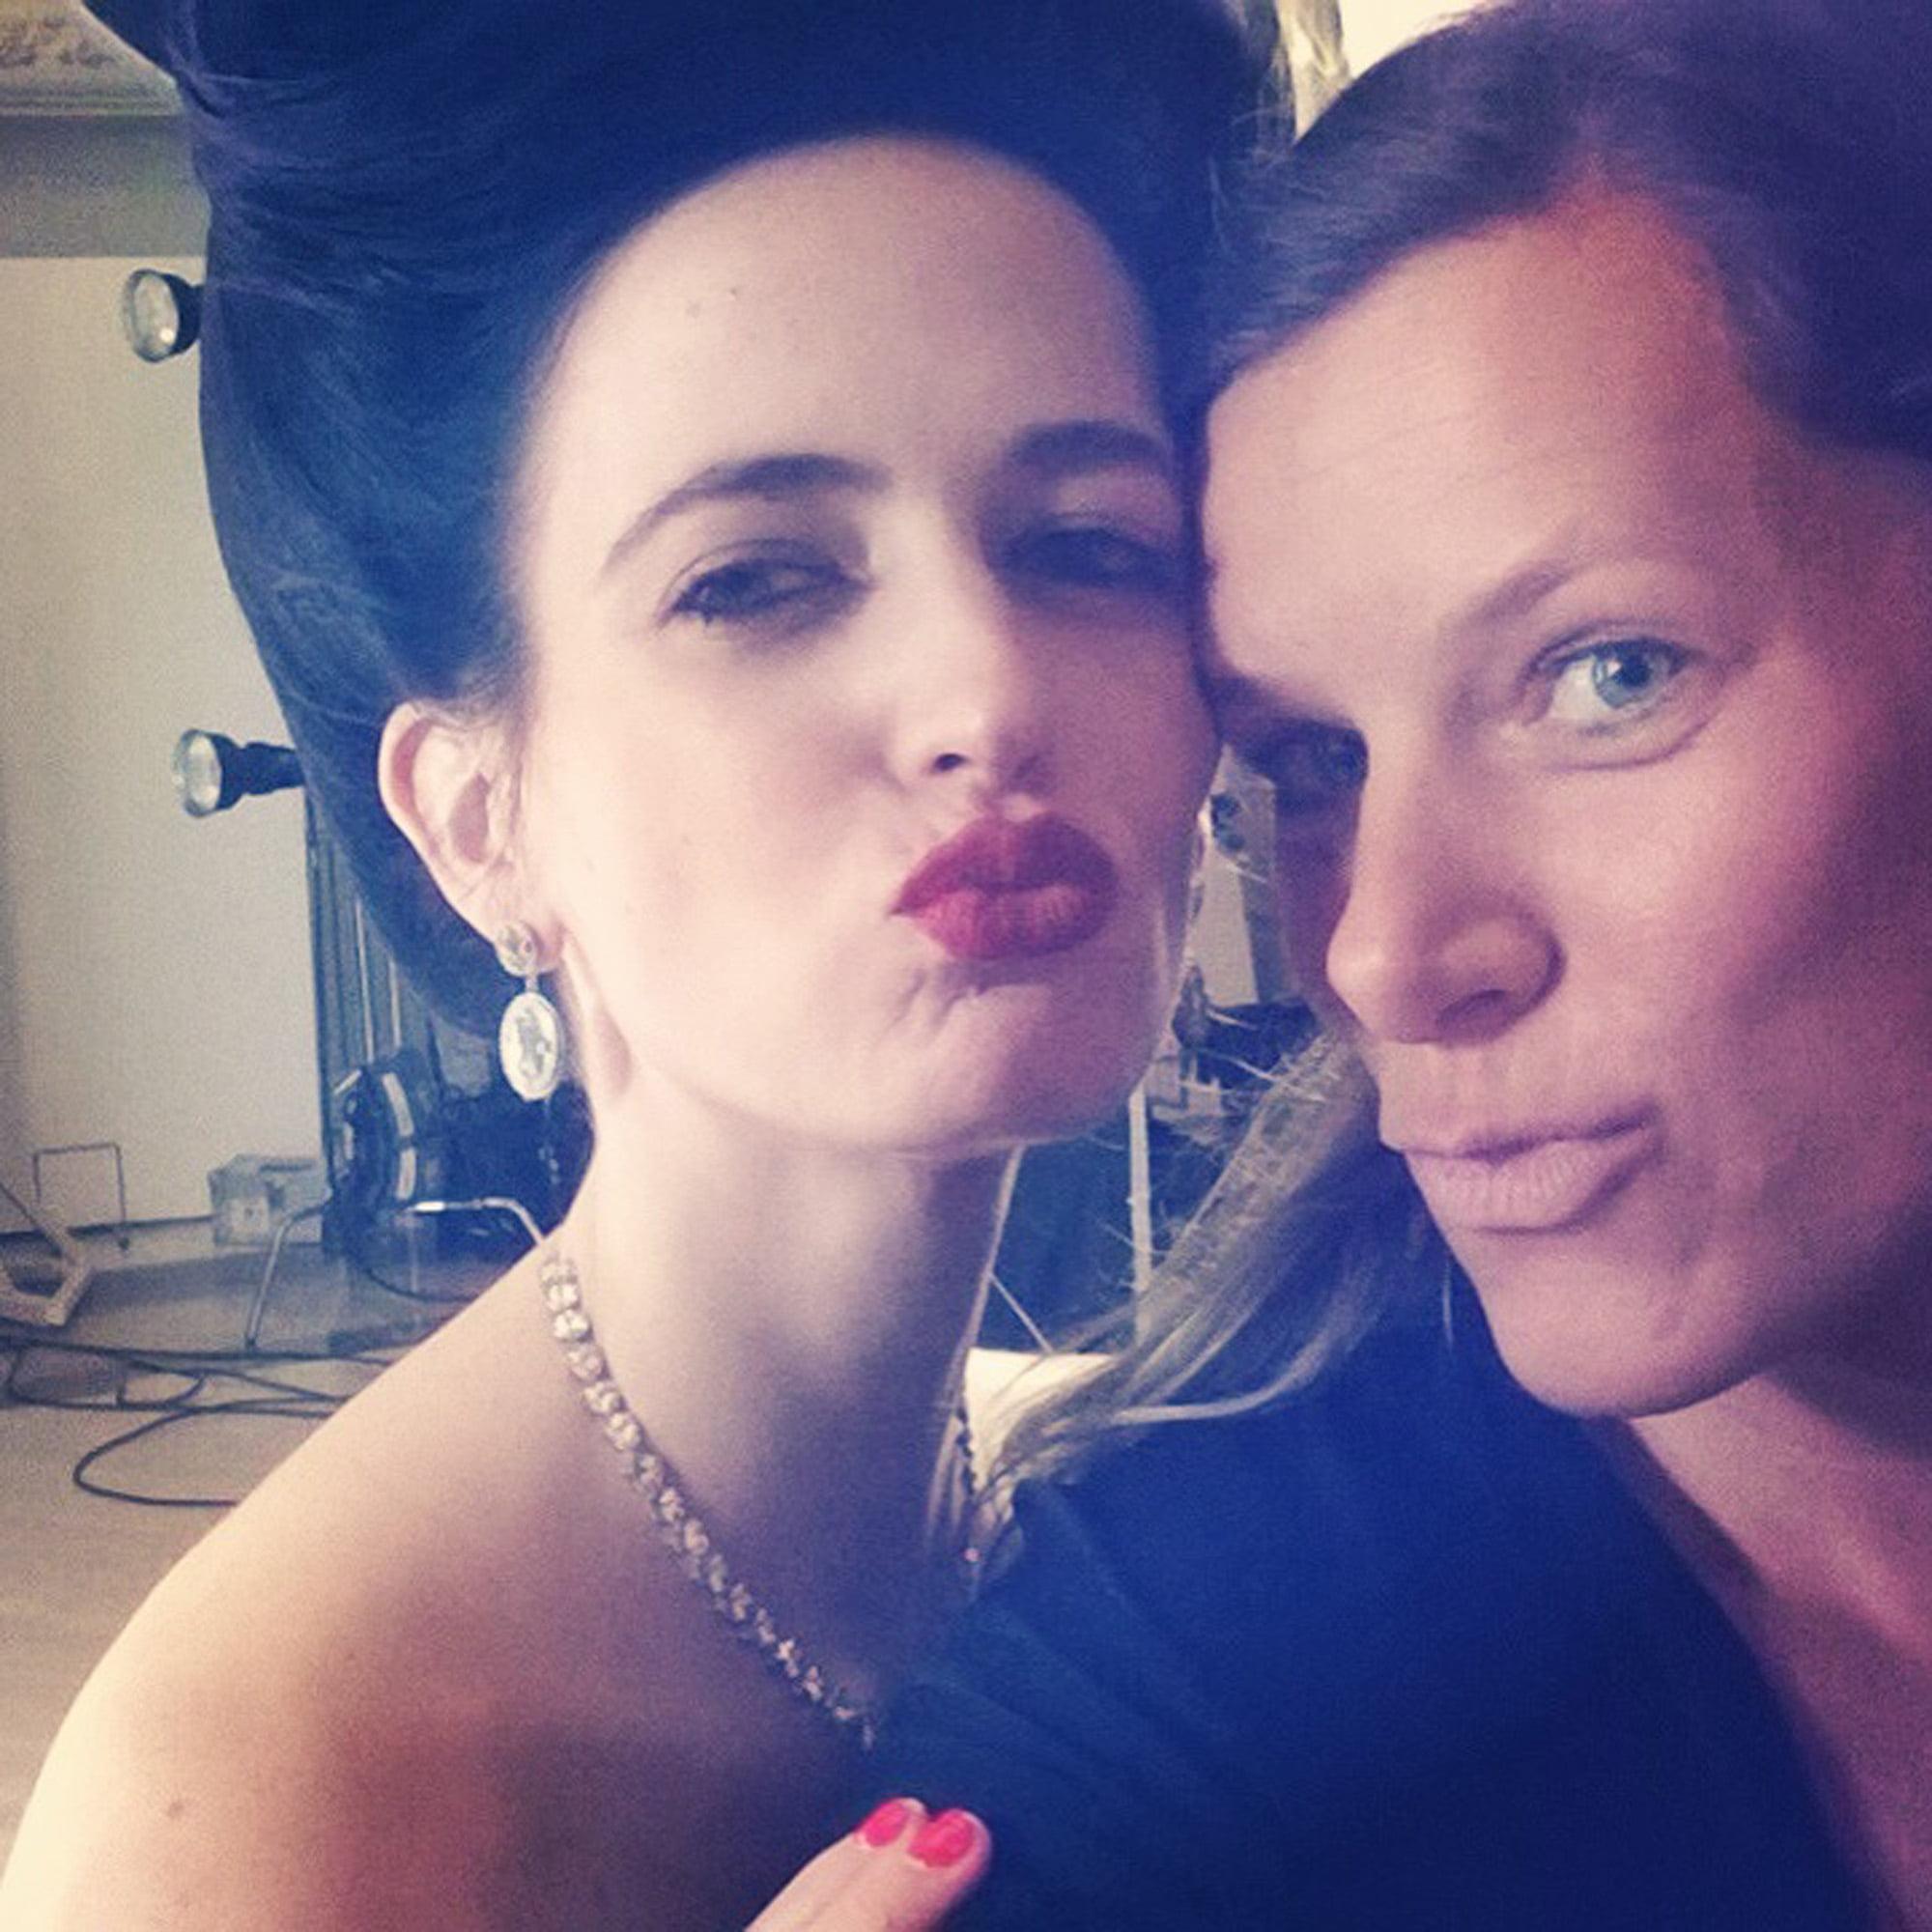 Selfie Eva Green nudes (96 images), Paparazzi